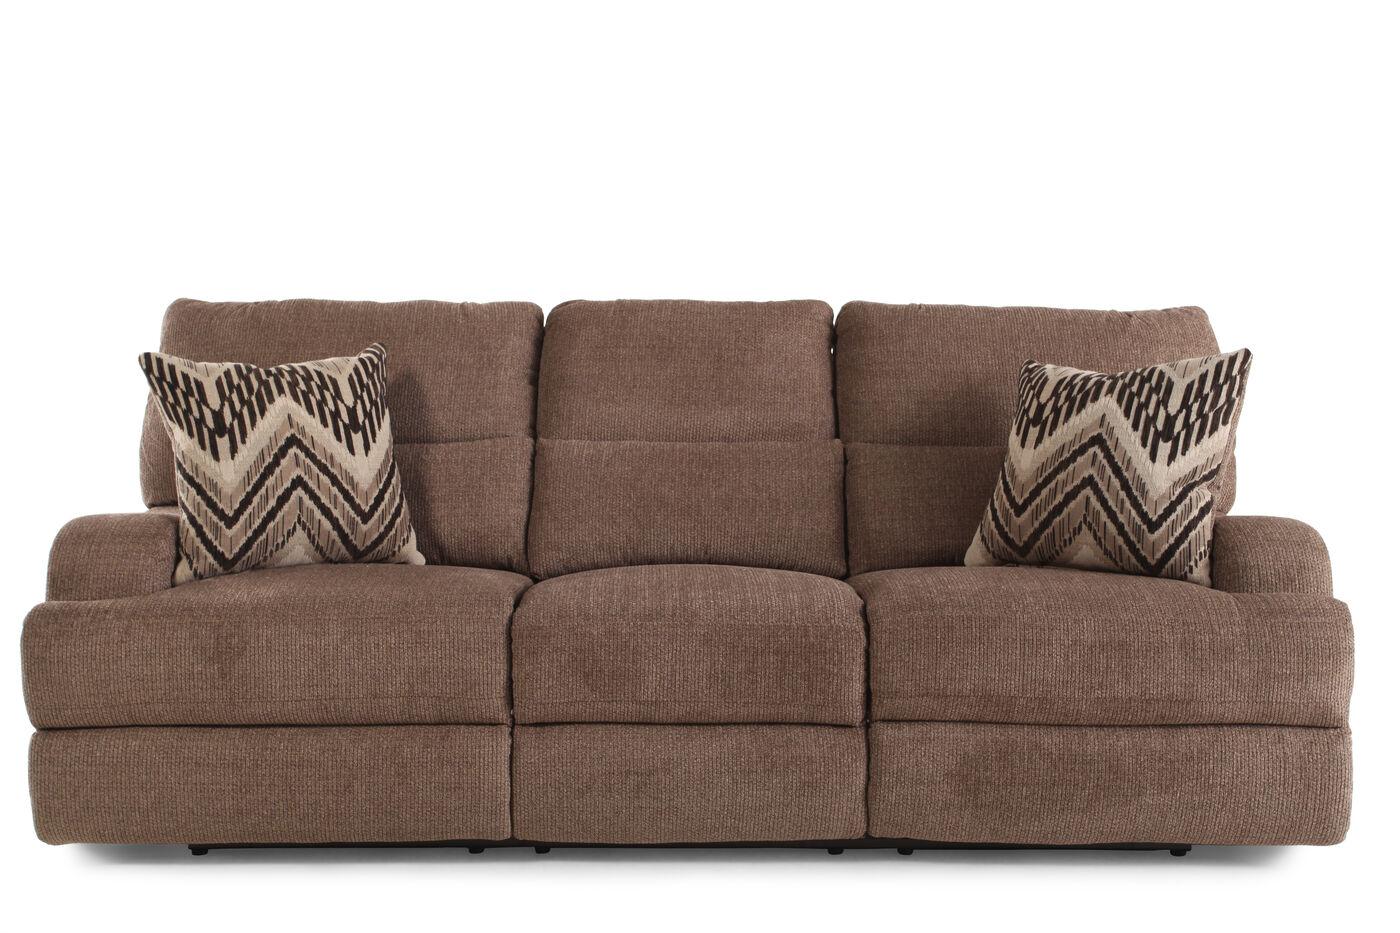 Living Room Sets Okc living room furniture okc – modern house